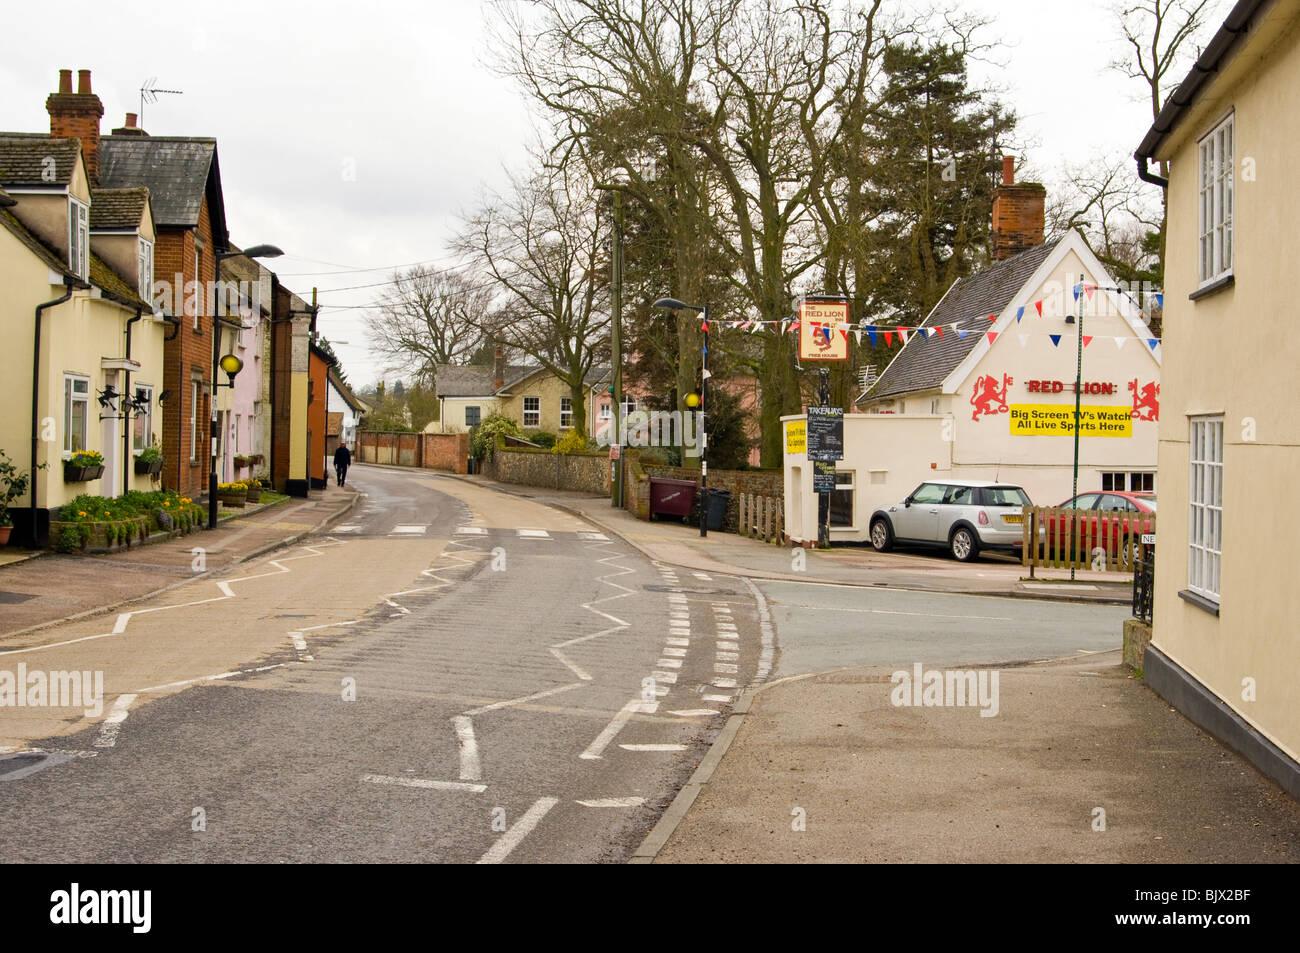 High Street Bildeston Suffolk - Stock Image